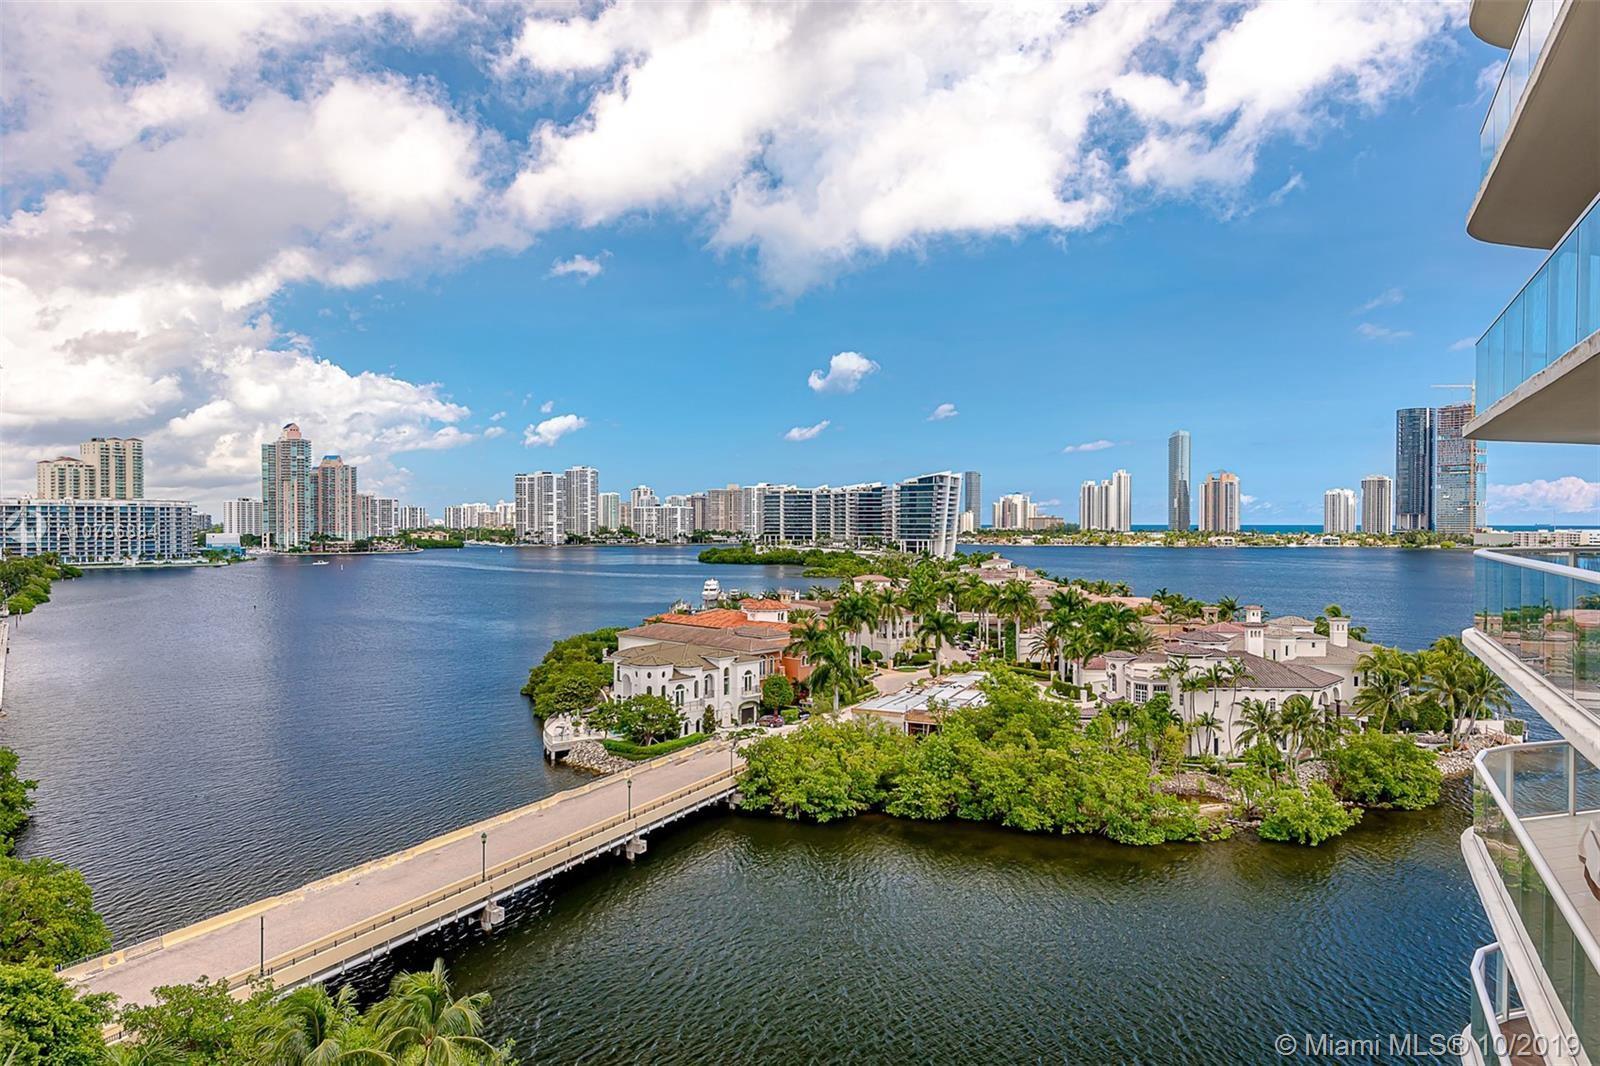 4000 Island Blvd #1005, Aventura, FL 33160 - #: A10756884